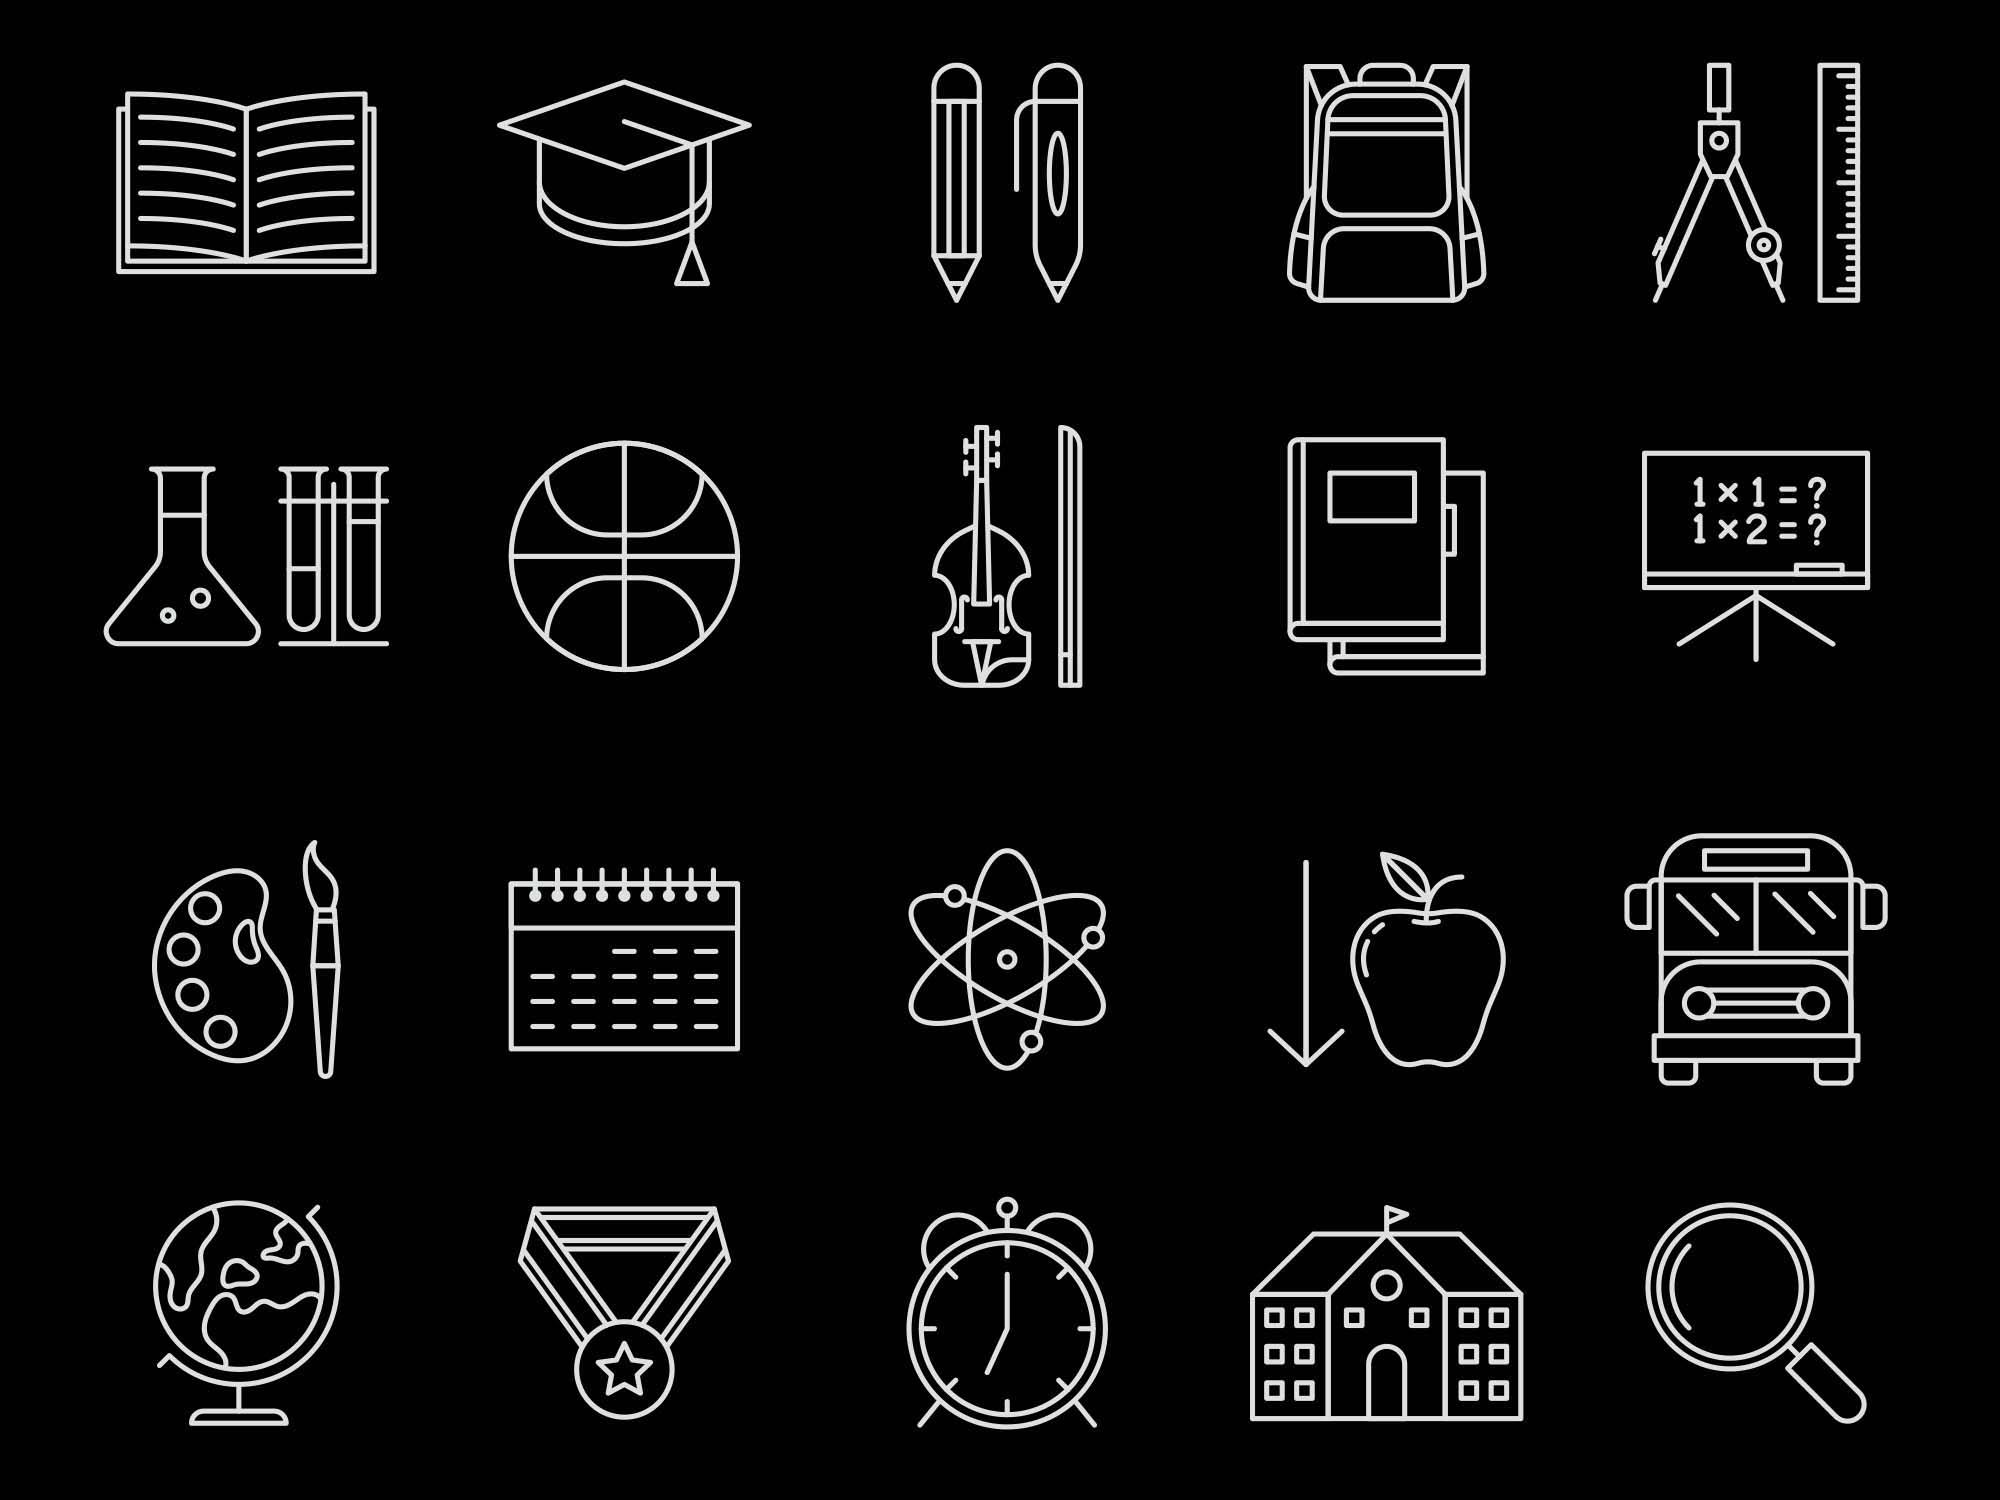 School Vector Icons 2